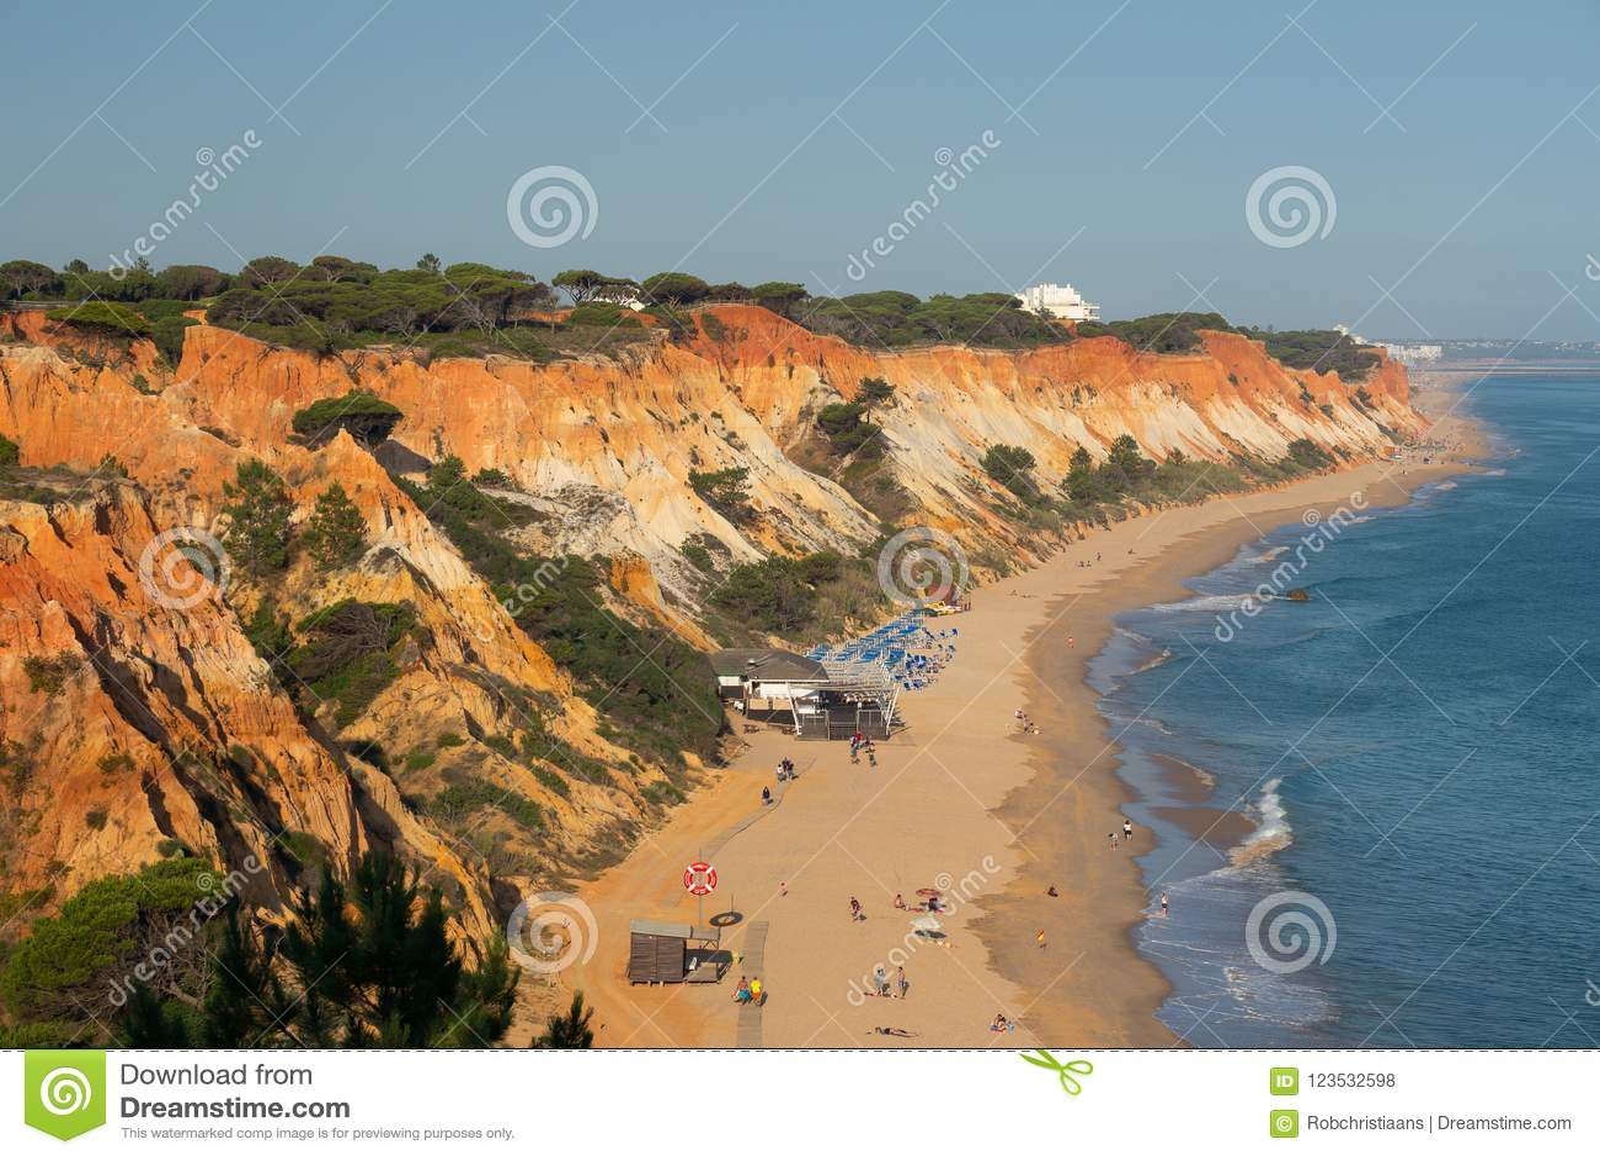 Schoner Strand Und Klippen In Algarve Portugal Nahe Albufeira